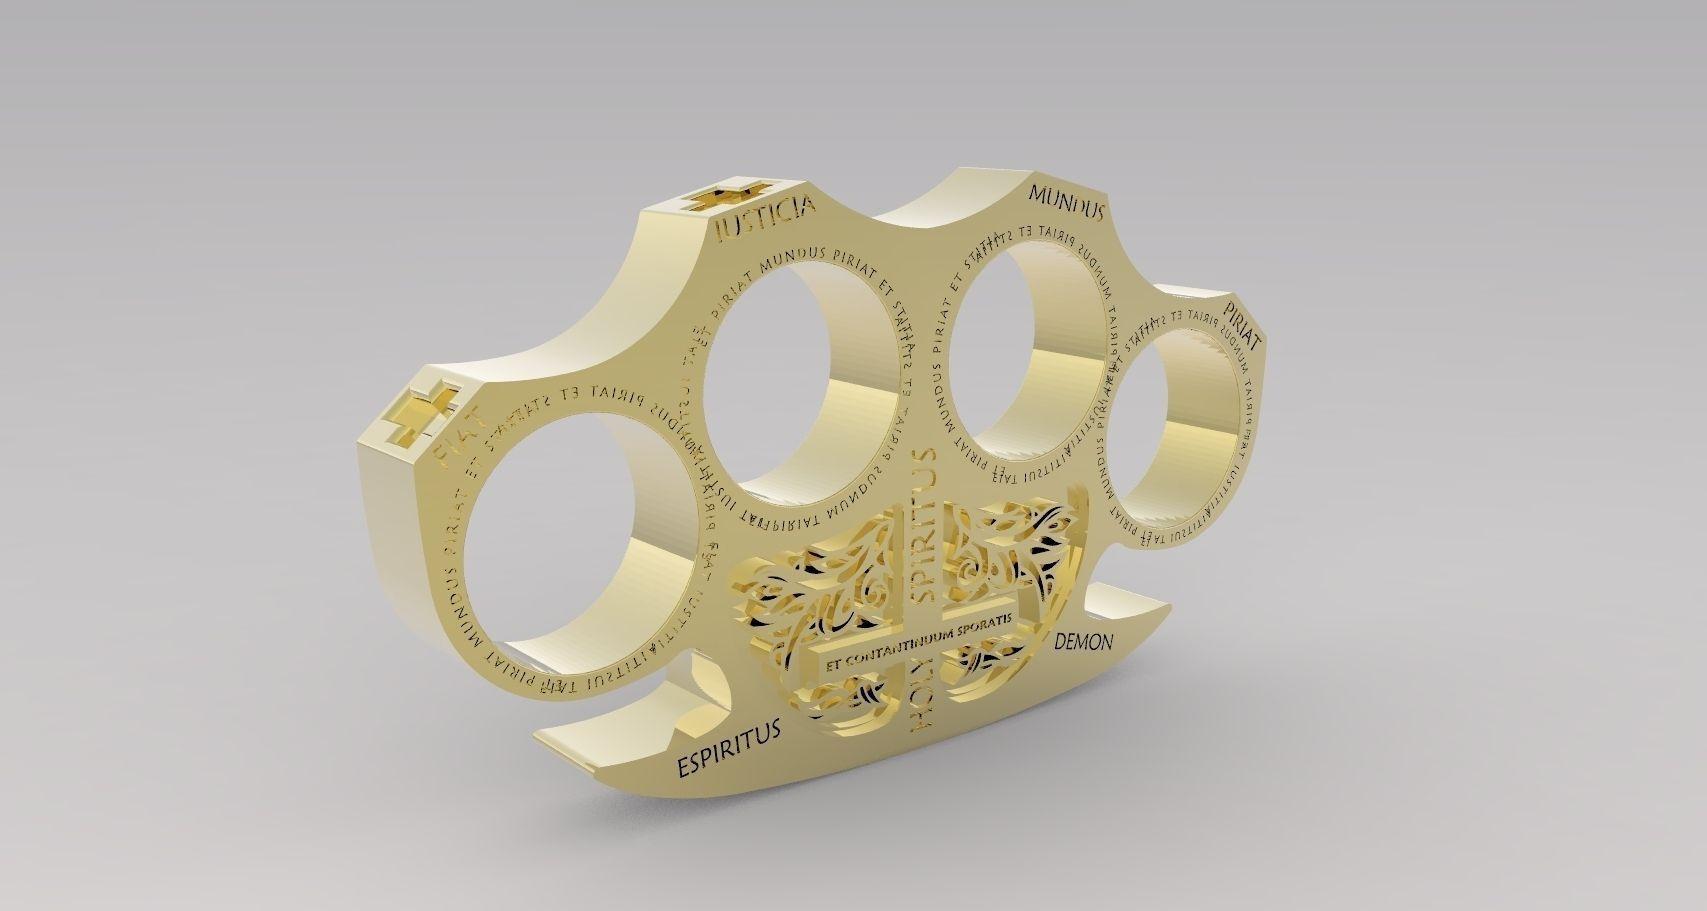 holy brass knuckles 3d model 3d printable stl cgtradercom